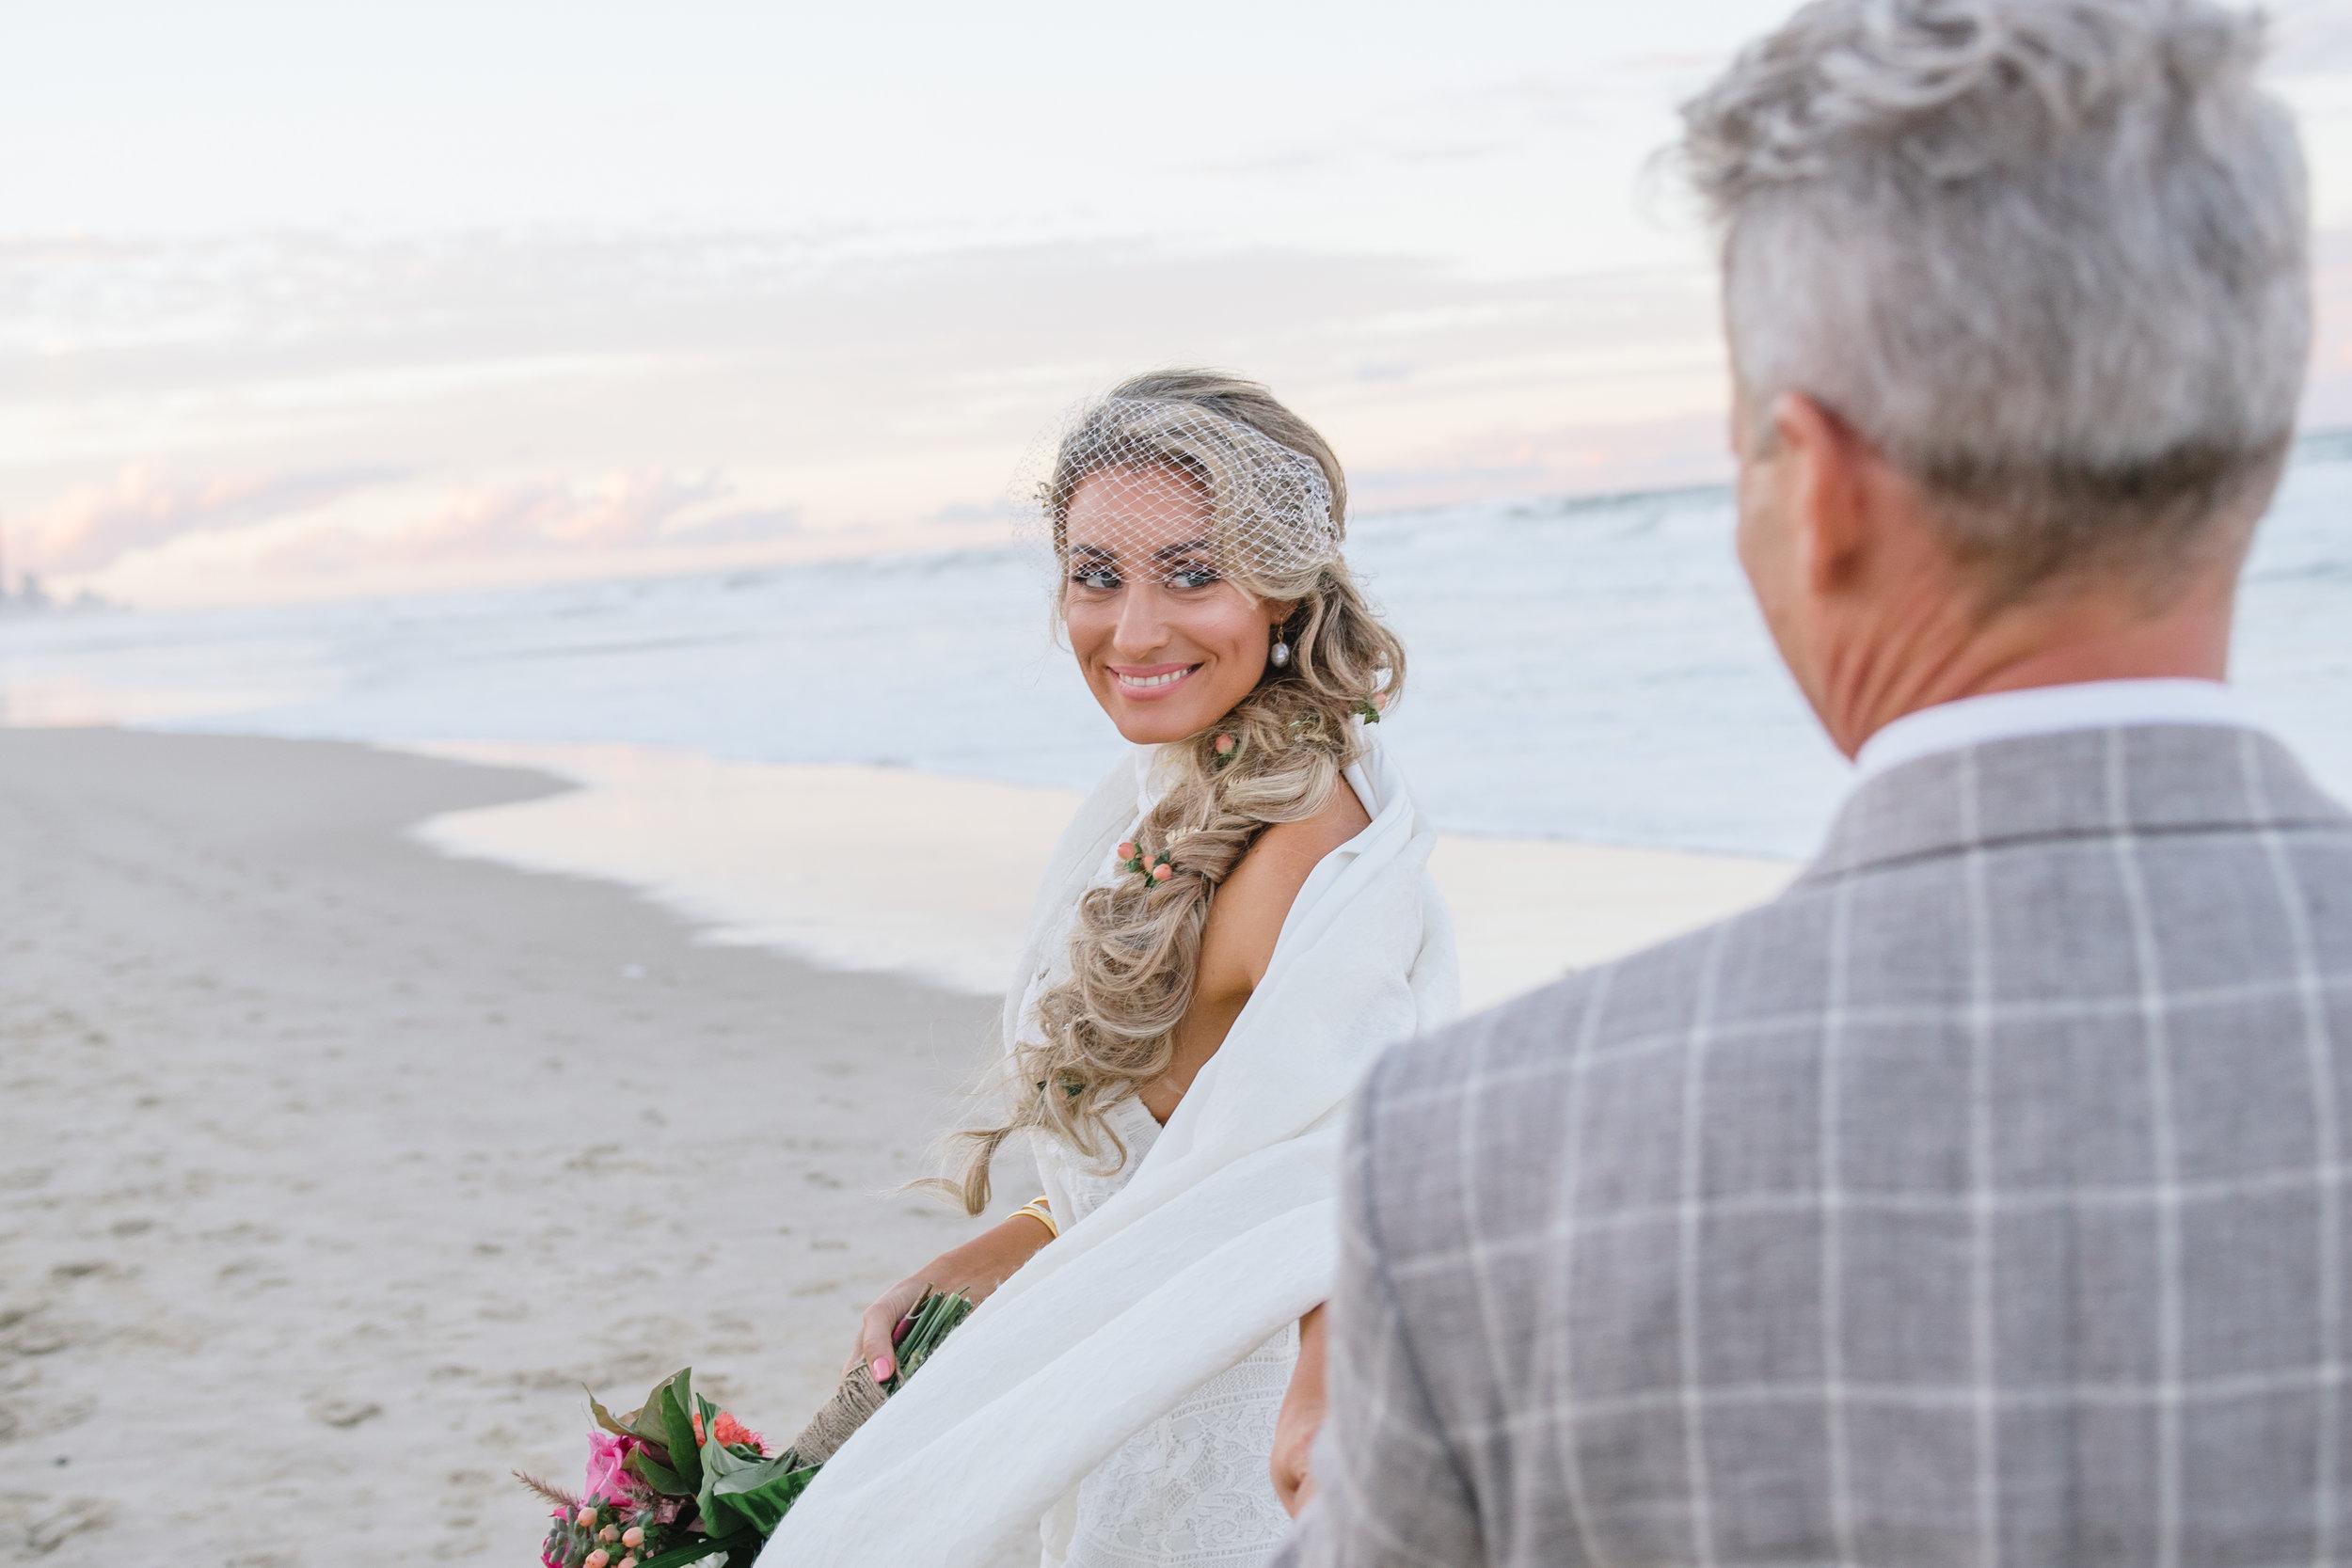 leah and cliff- skyla sage photography   wedding photographer, byron bay wedding and family photographer, tweed heads wedding and family photography-324.jpg